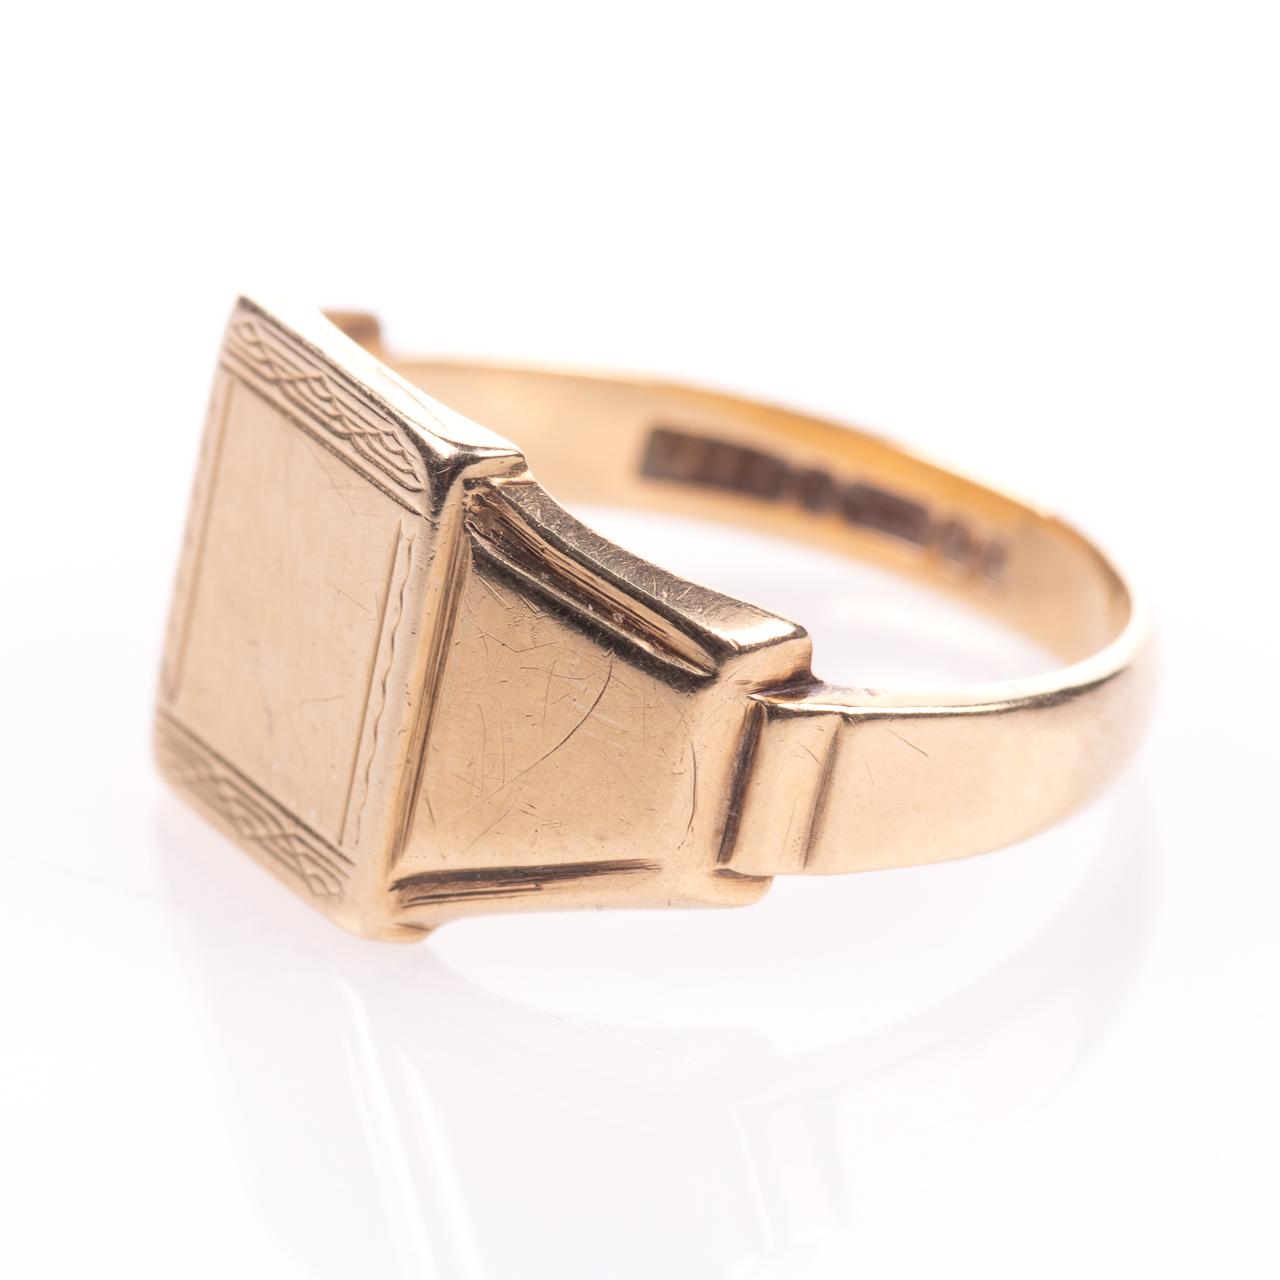 Art Deco Style Gentleman's Signet Ring 9ct Gold - Image 4 of 7